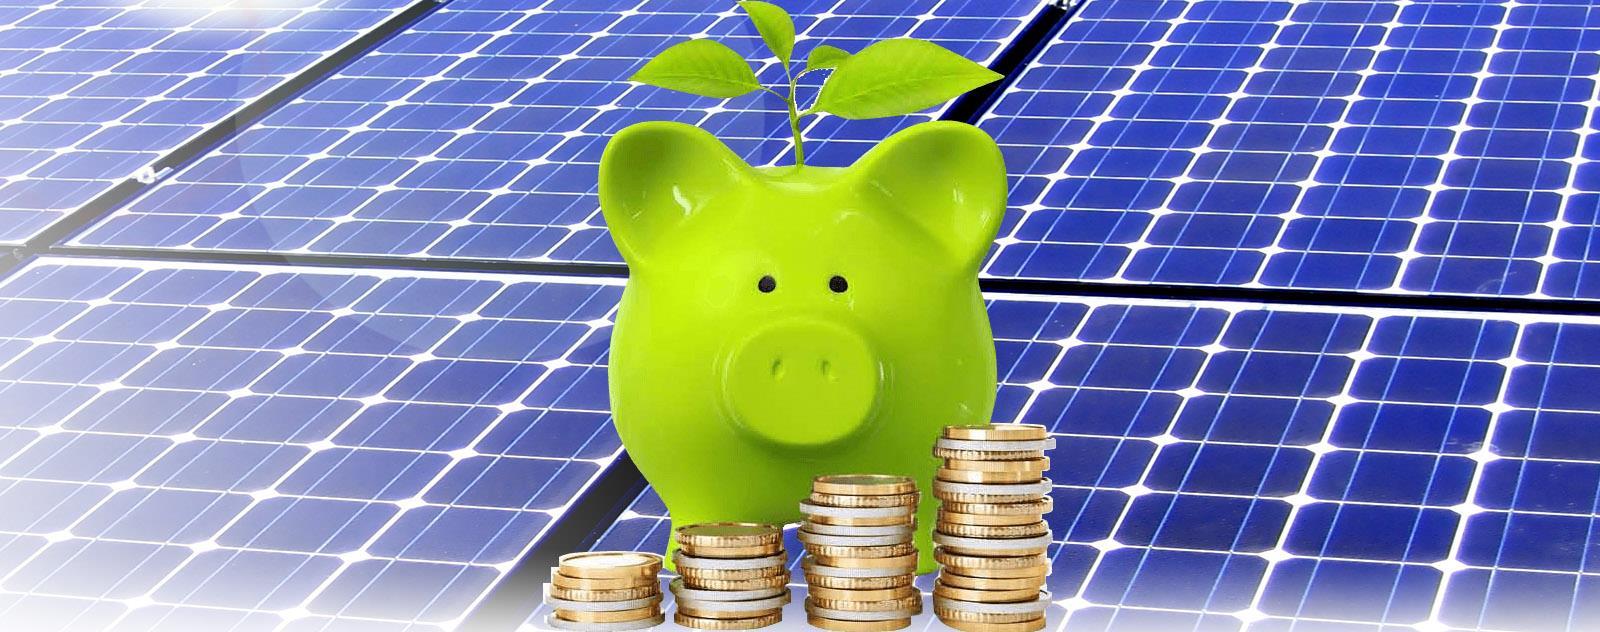 fotovoltaico risparmio elettropiemme